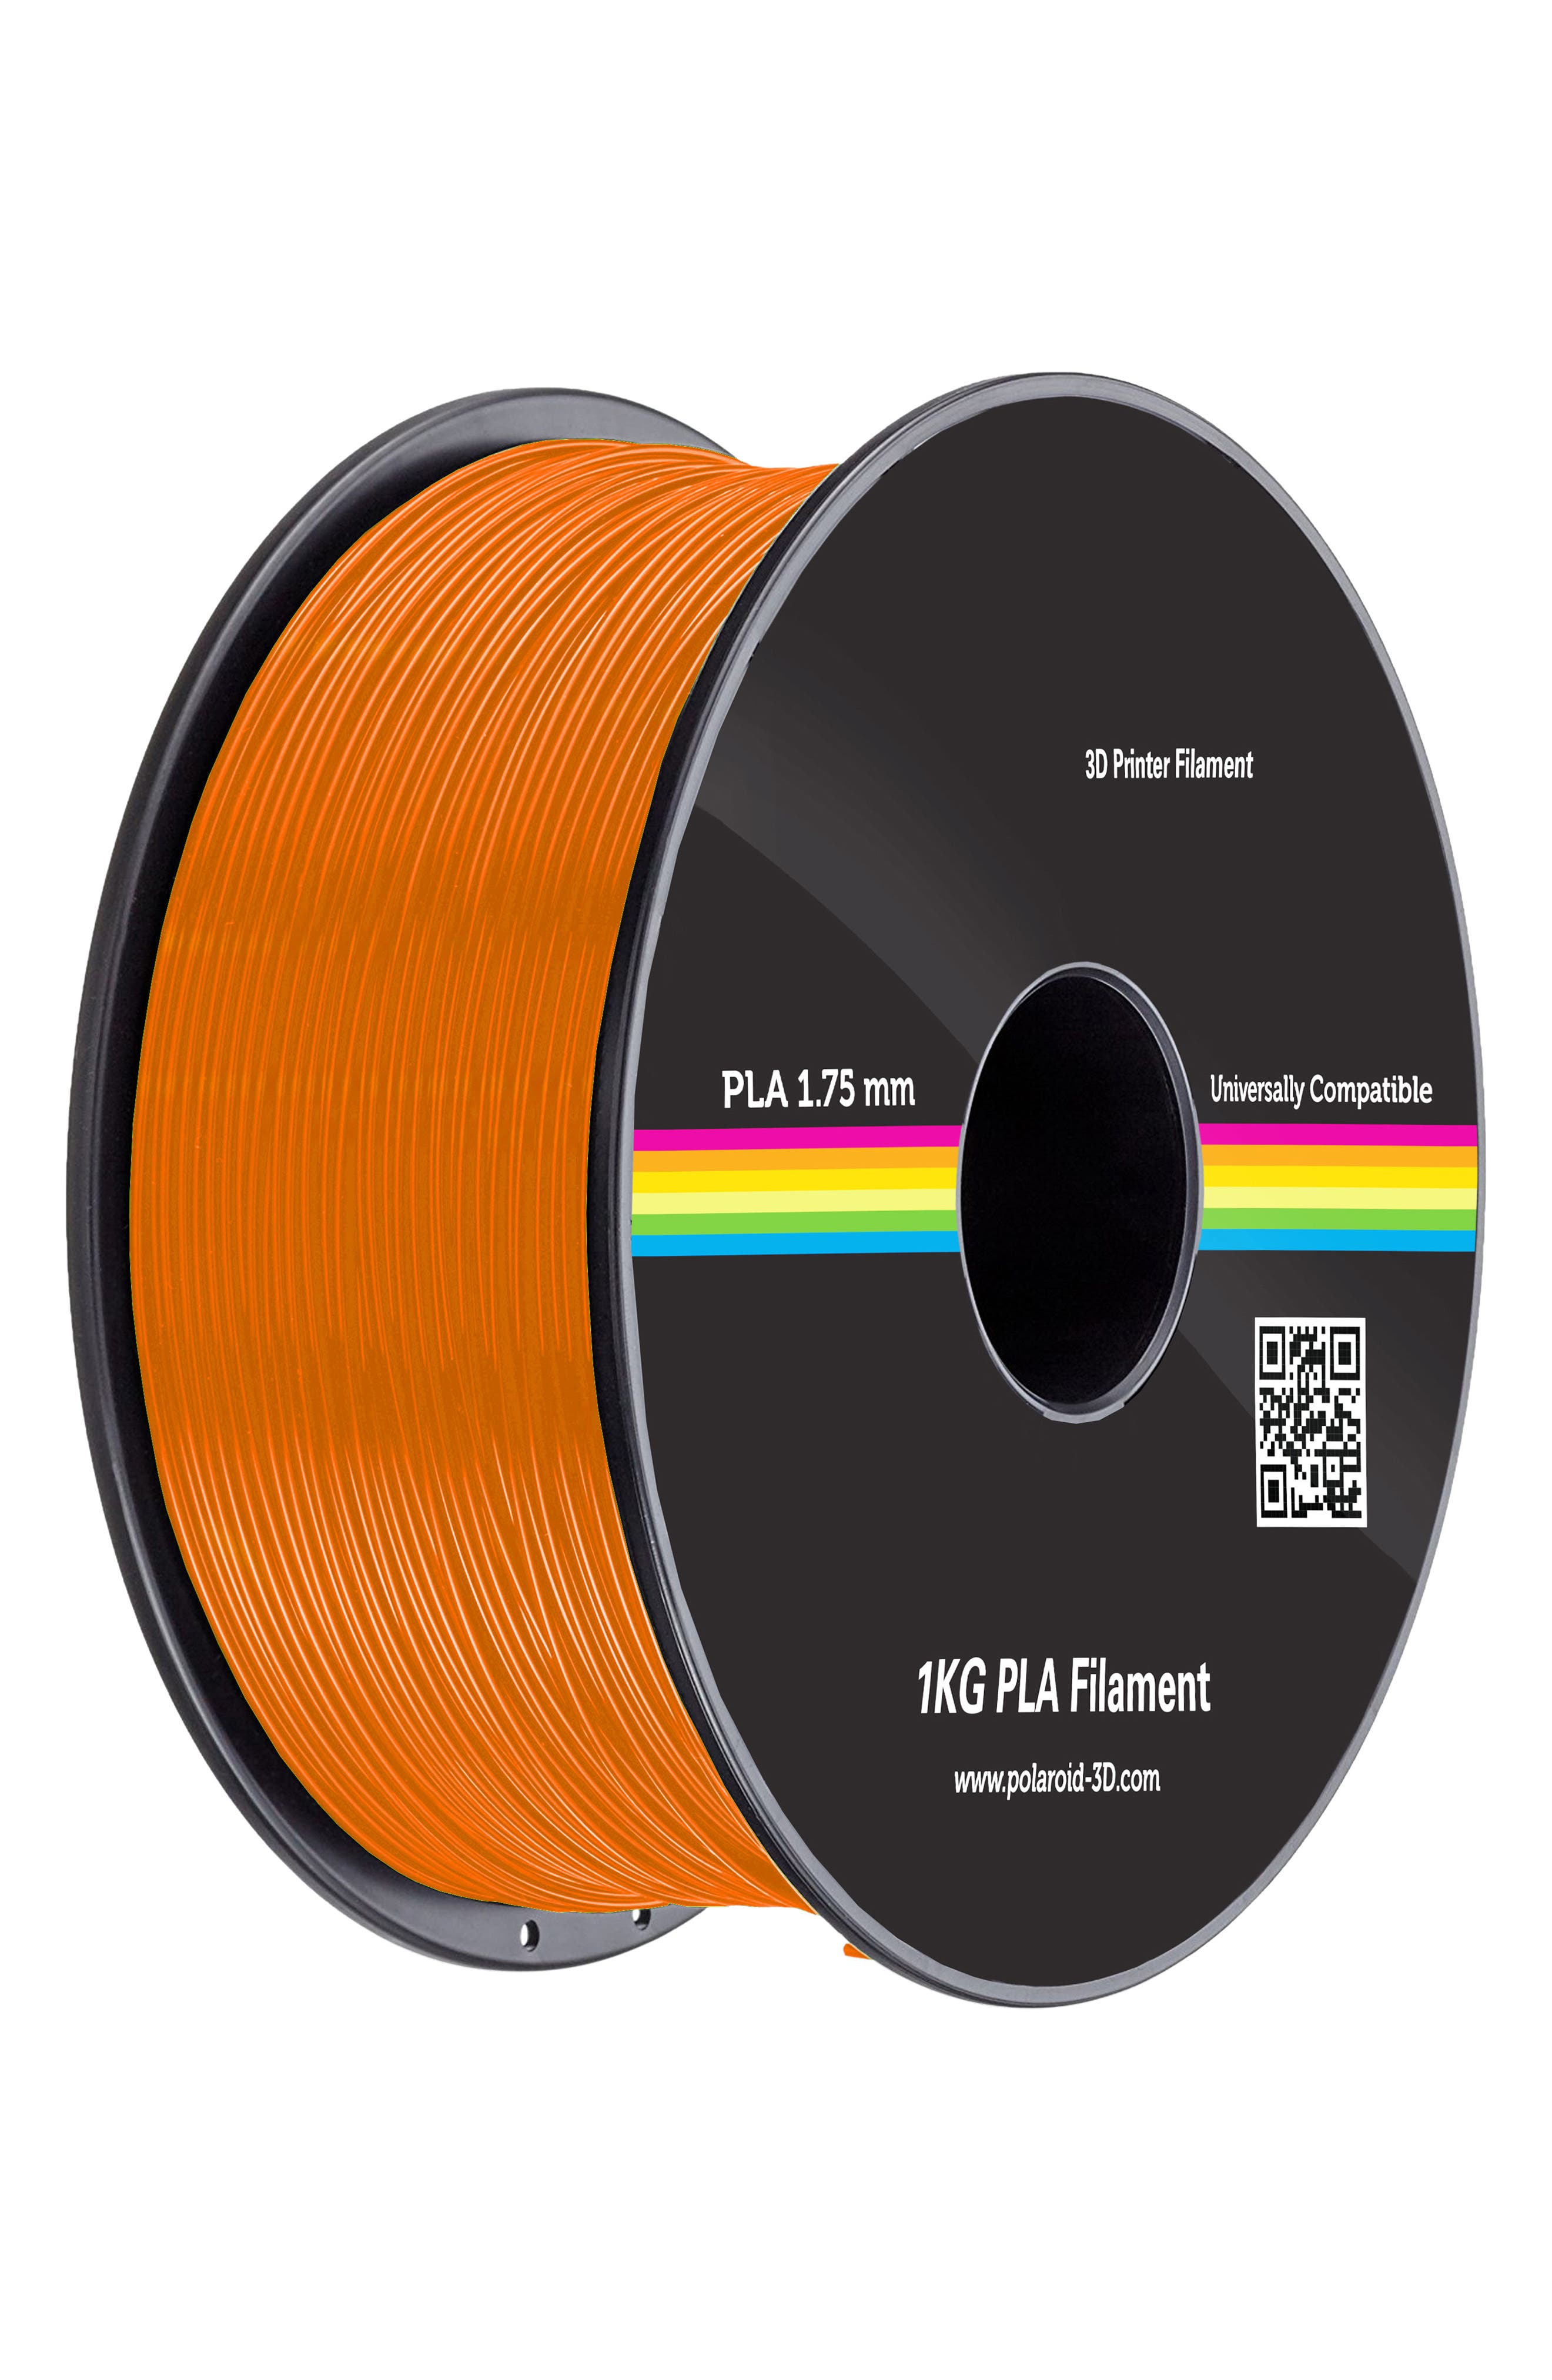 Main Image - Polaroid 3D 1KG Filament Roll